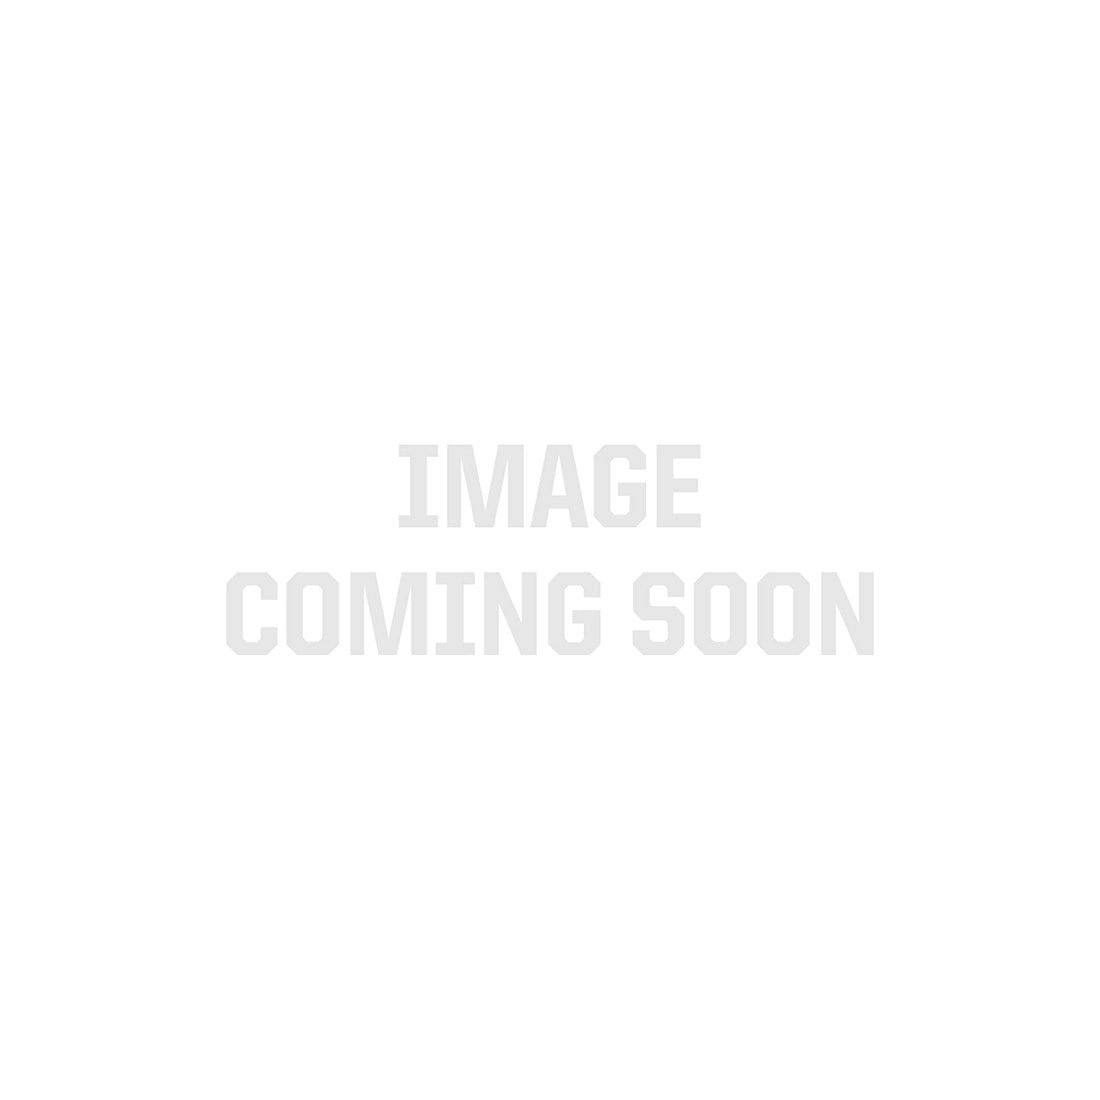 LumenMax 2835 LED Strip Light - 2,700K - 240/m - CurrentControl - Sample Kit